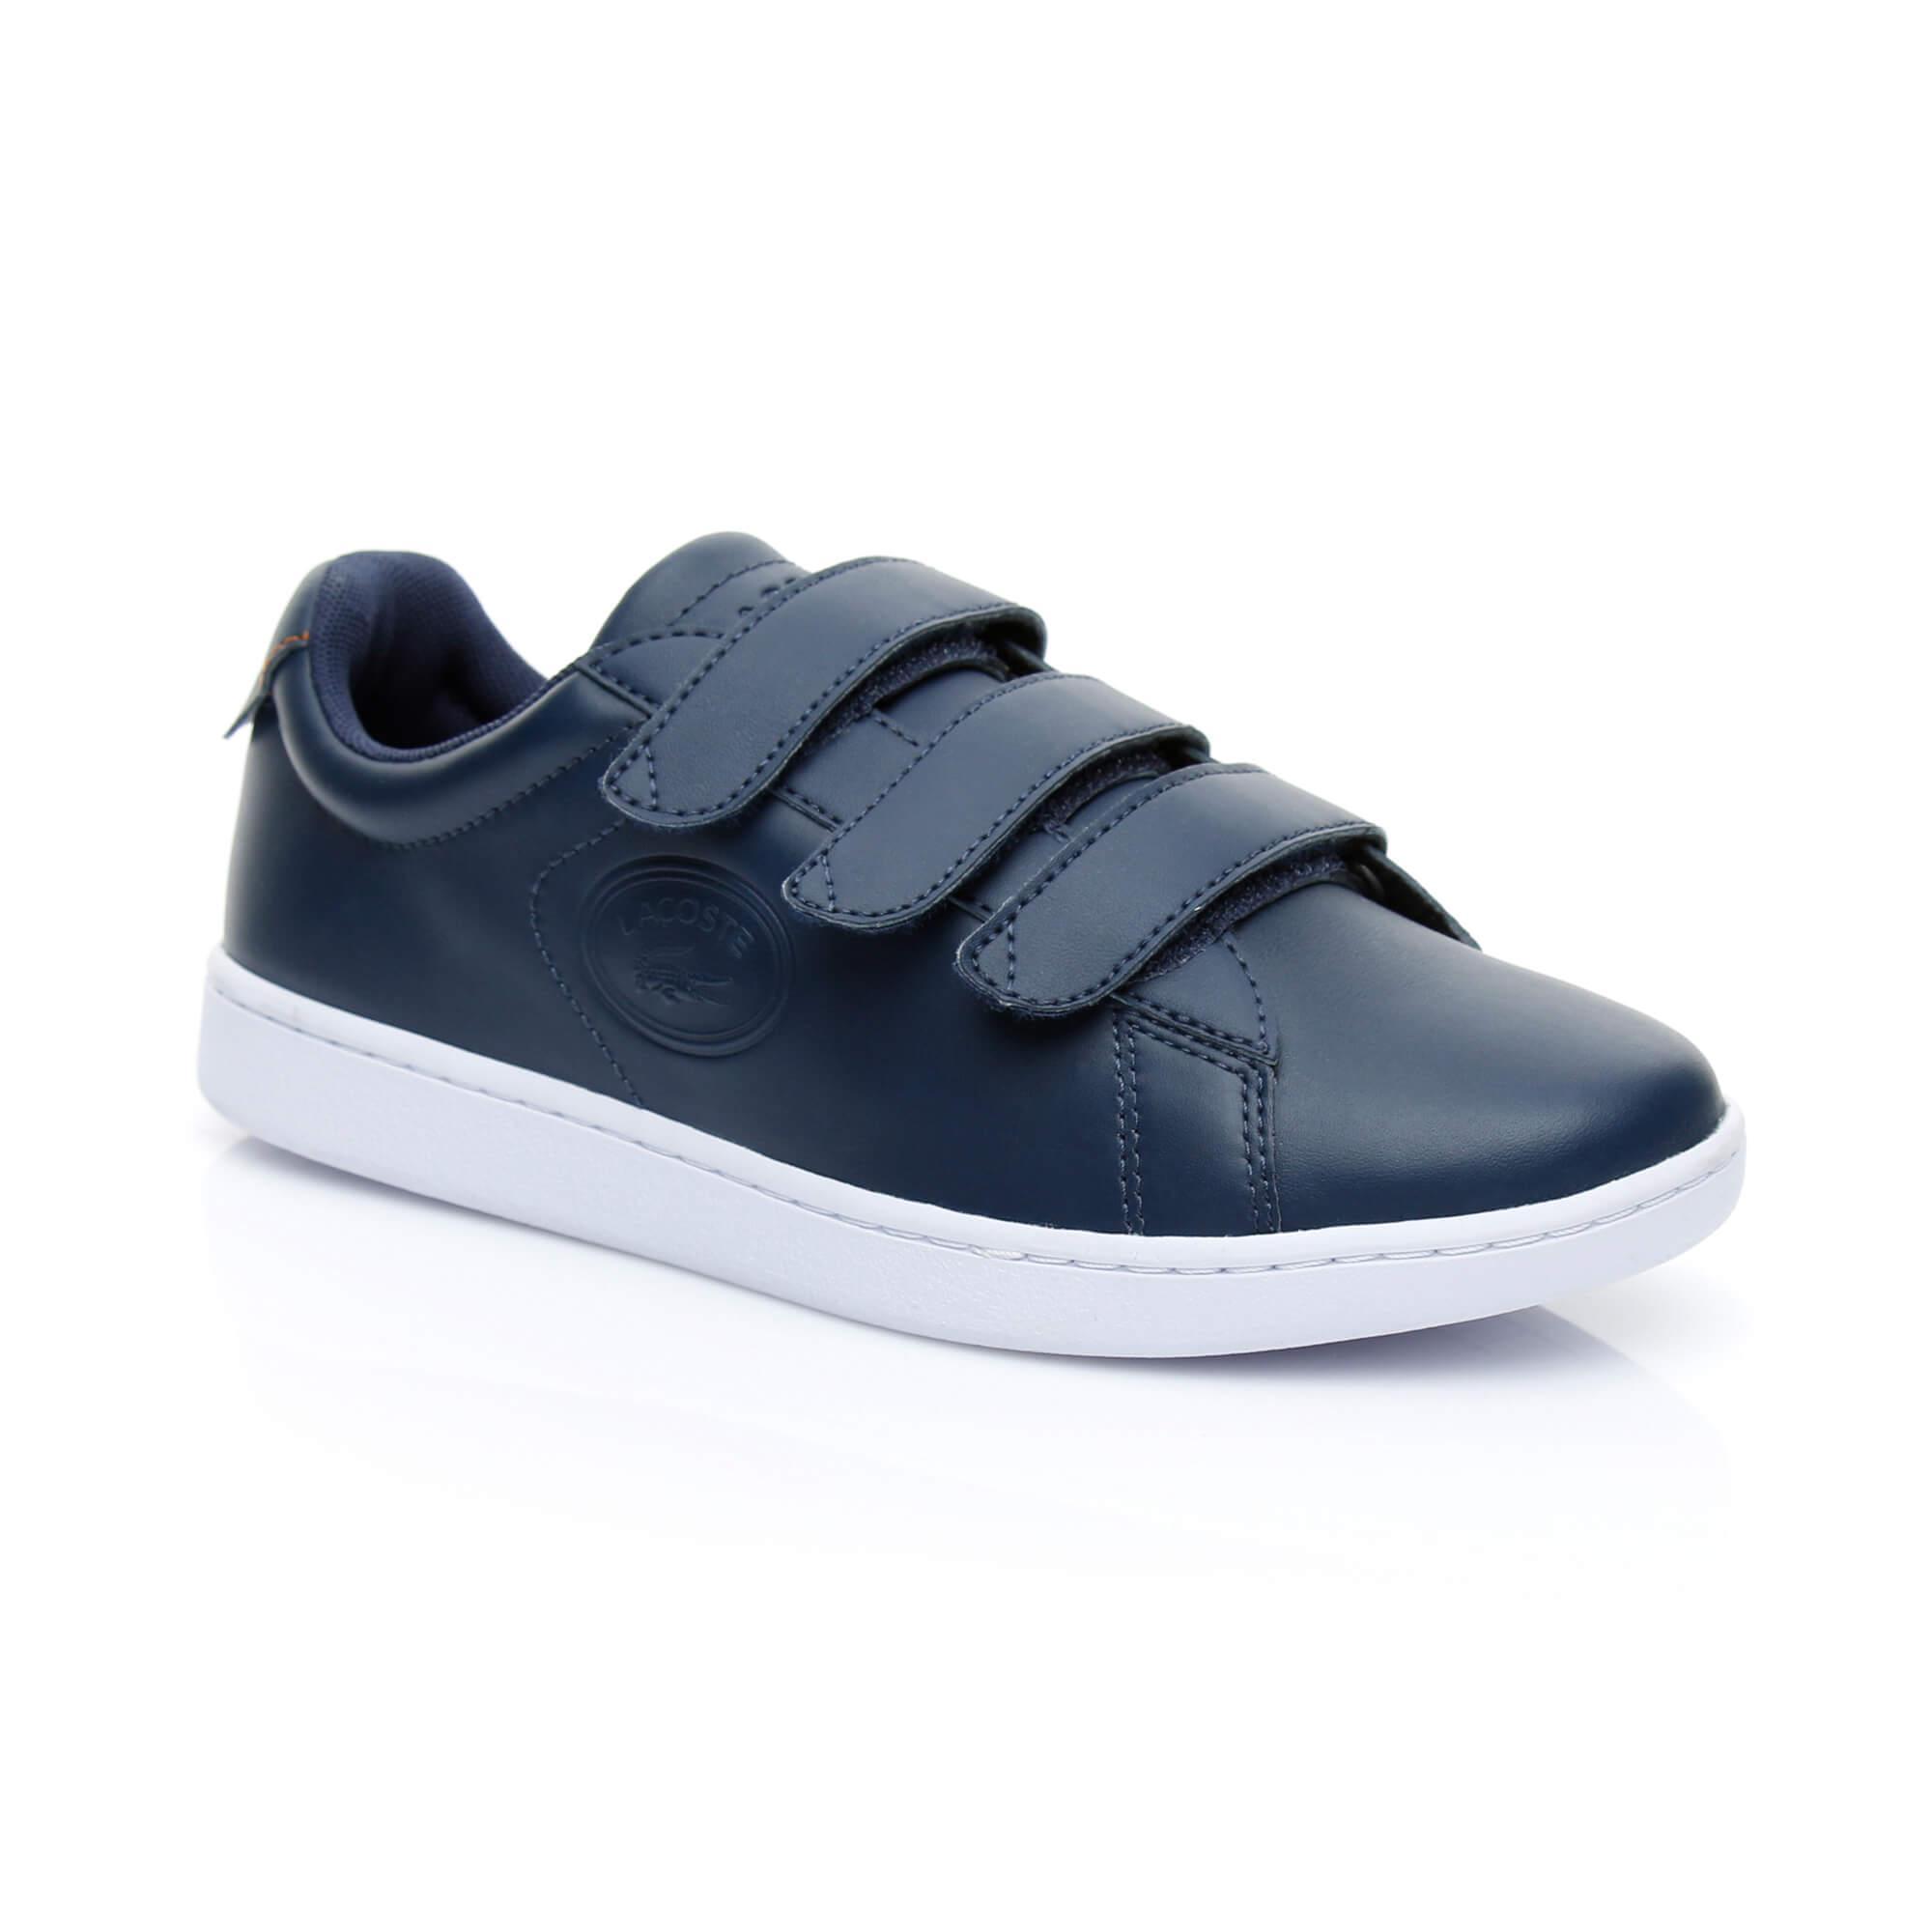 Lacoste Kadın Carnaby Evo Strap 3181 Lacivert Sneaker